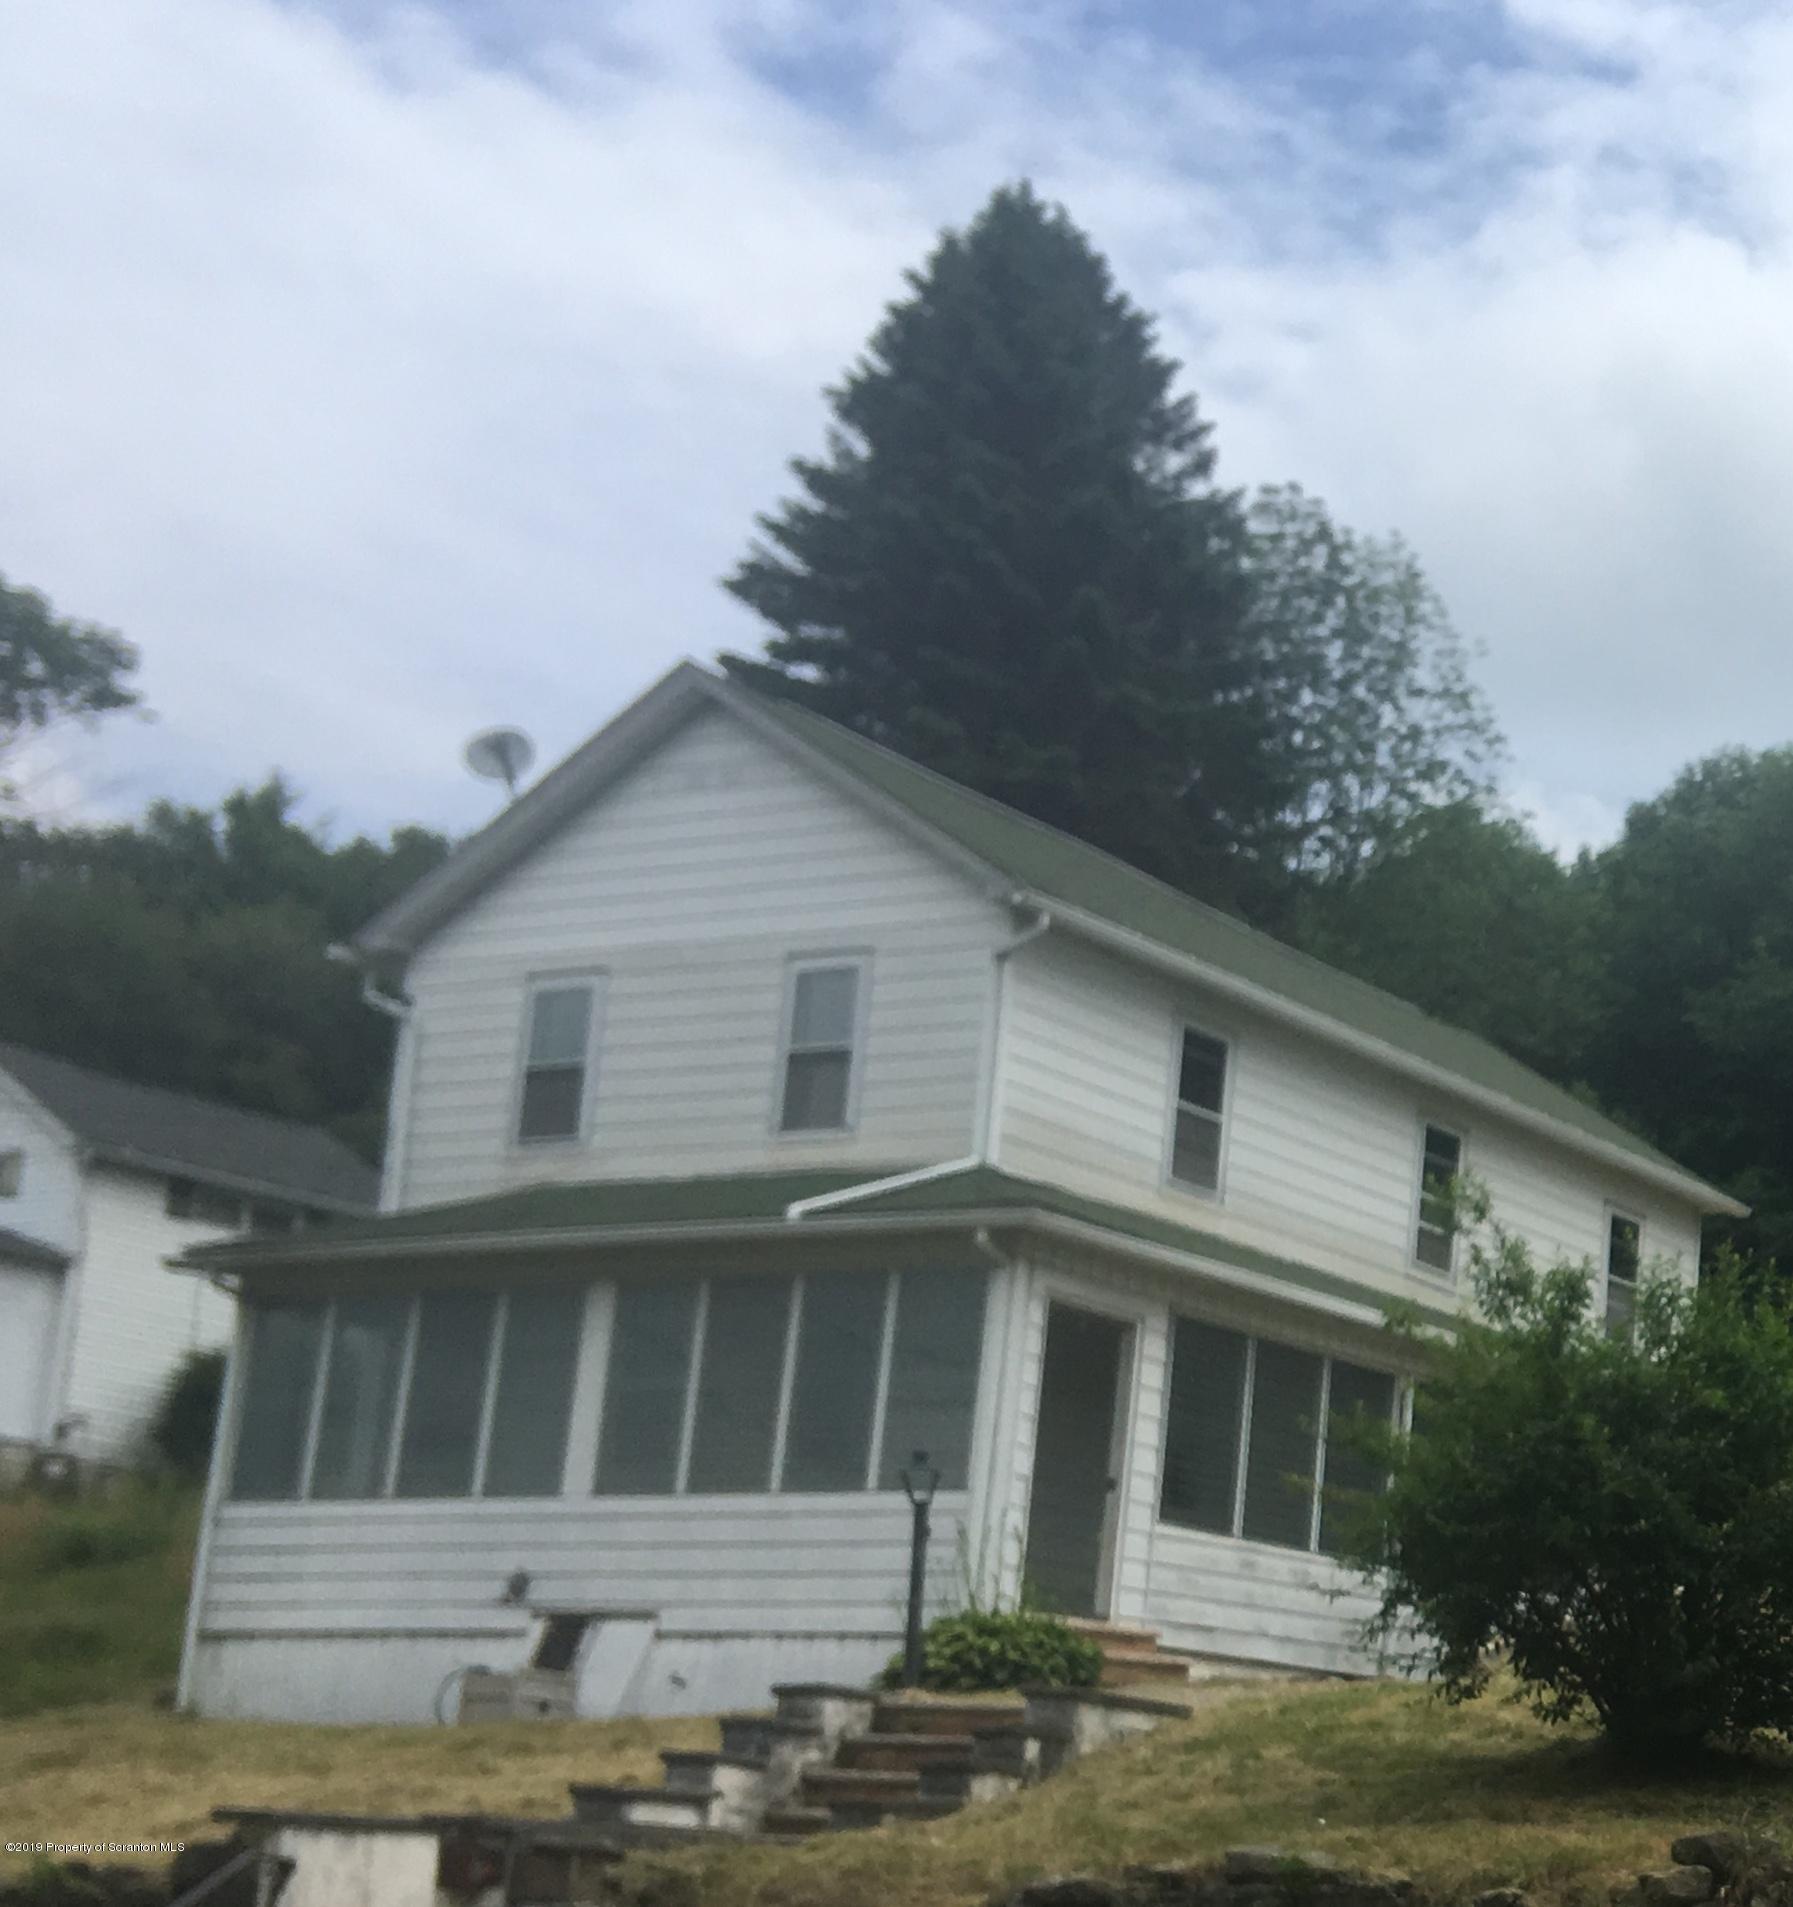 374 U Powderly St, Carbondale, Pennsylvania 18407, 3 Bedrooms Bedrooms, 5 Rooms Rooms,1 BathroomBathrooms,Single Family,For Sale,U Powderly,19-3168